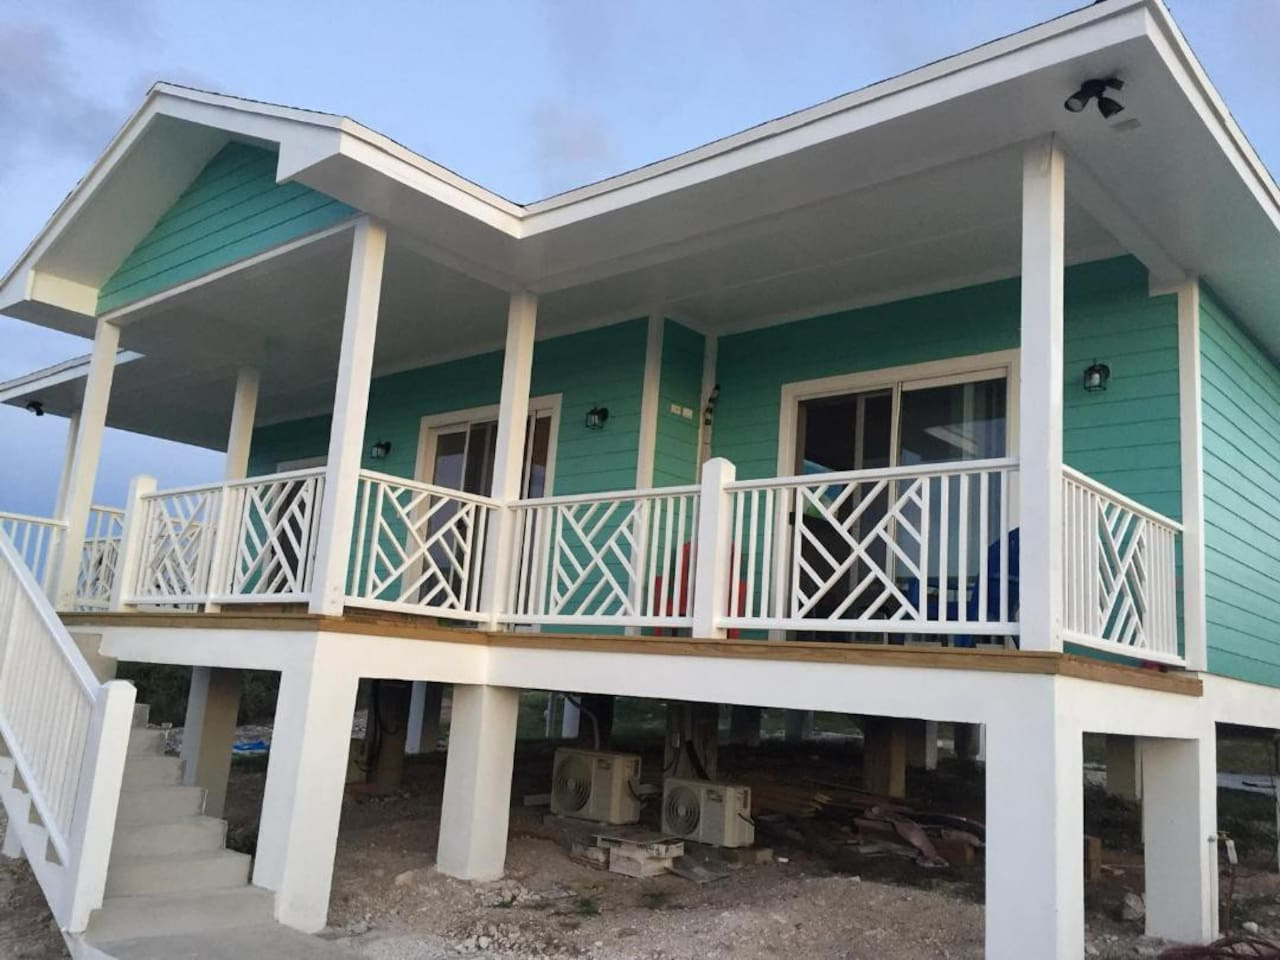 Porch that faces the Atlantic Ocean